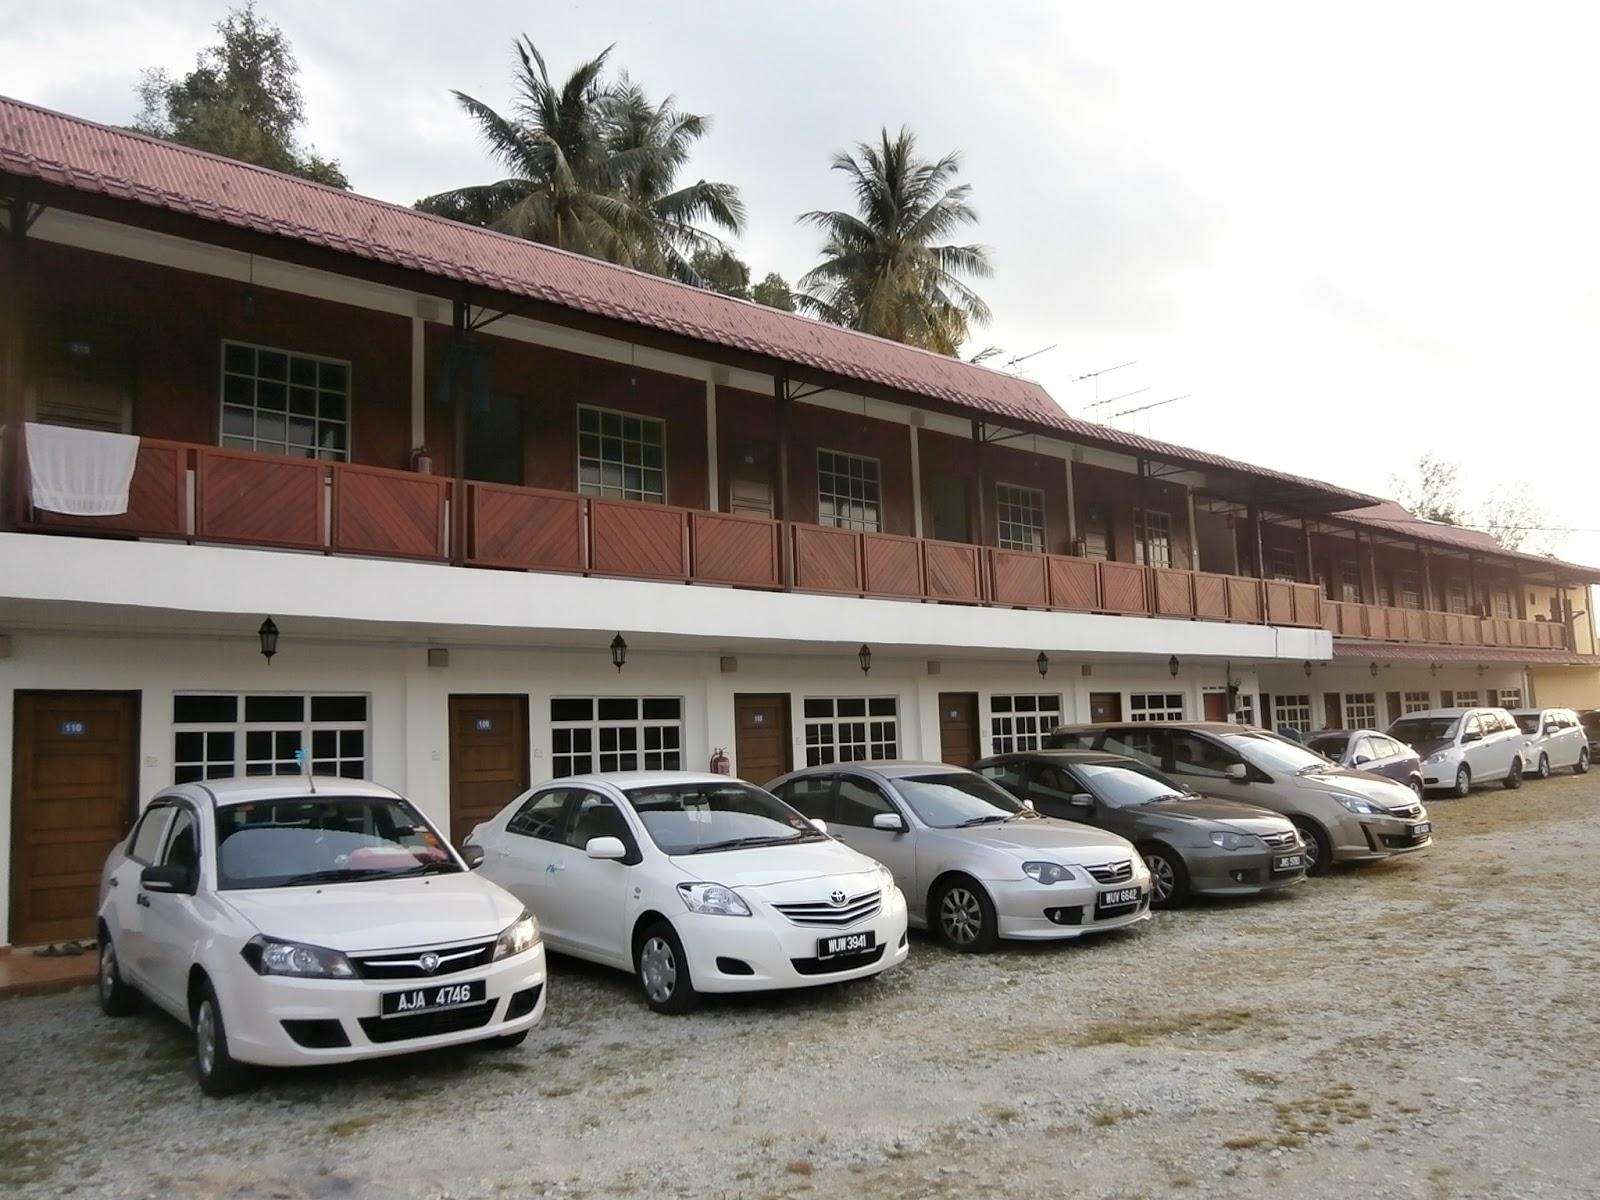 Baru Siap Agaknya Sebab 2 Tahun Lepas Kami Bermalam Di Resort Ini Bangunan Masih Dalam Pembinaan Lama Seperti Rumah Melayu Terletak